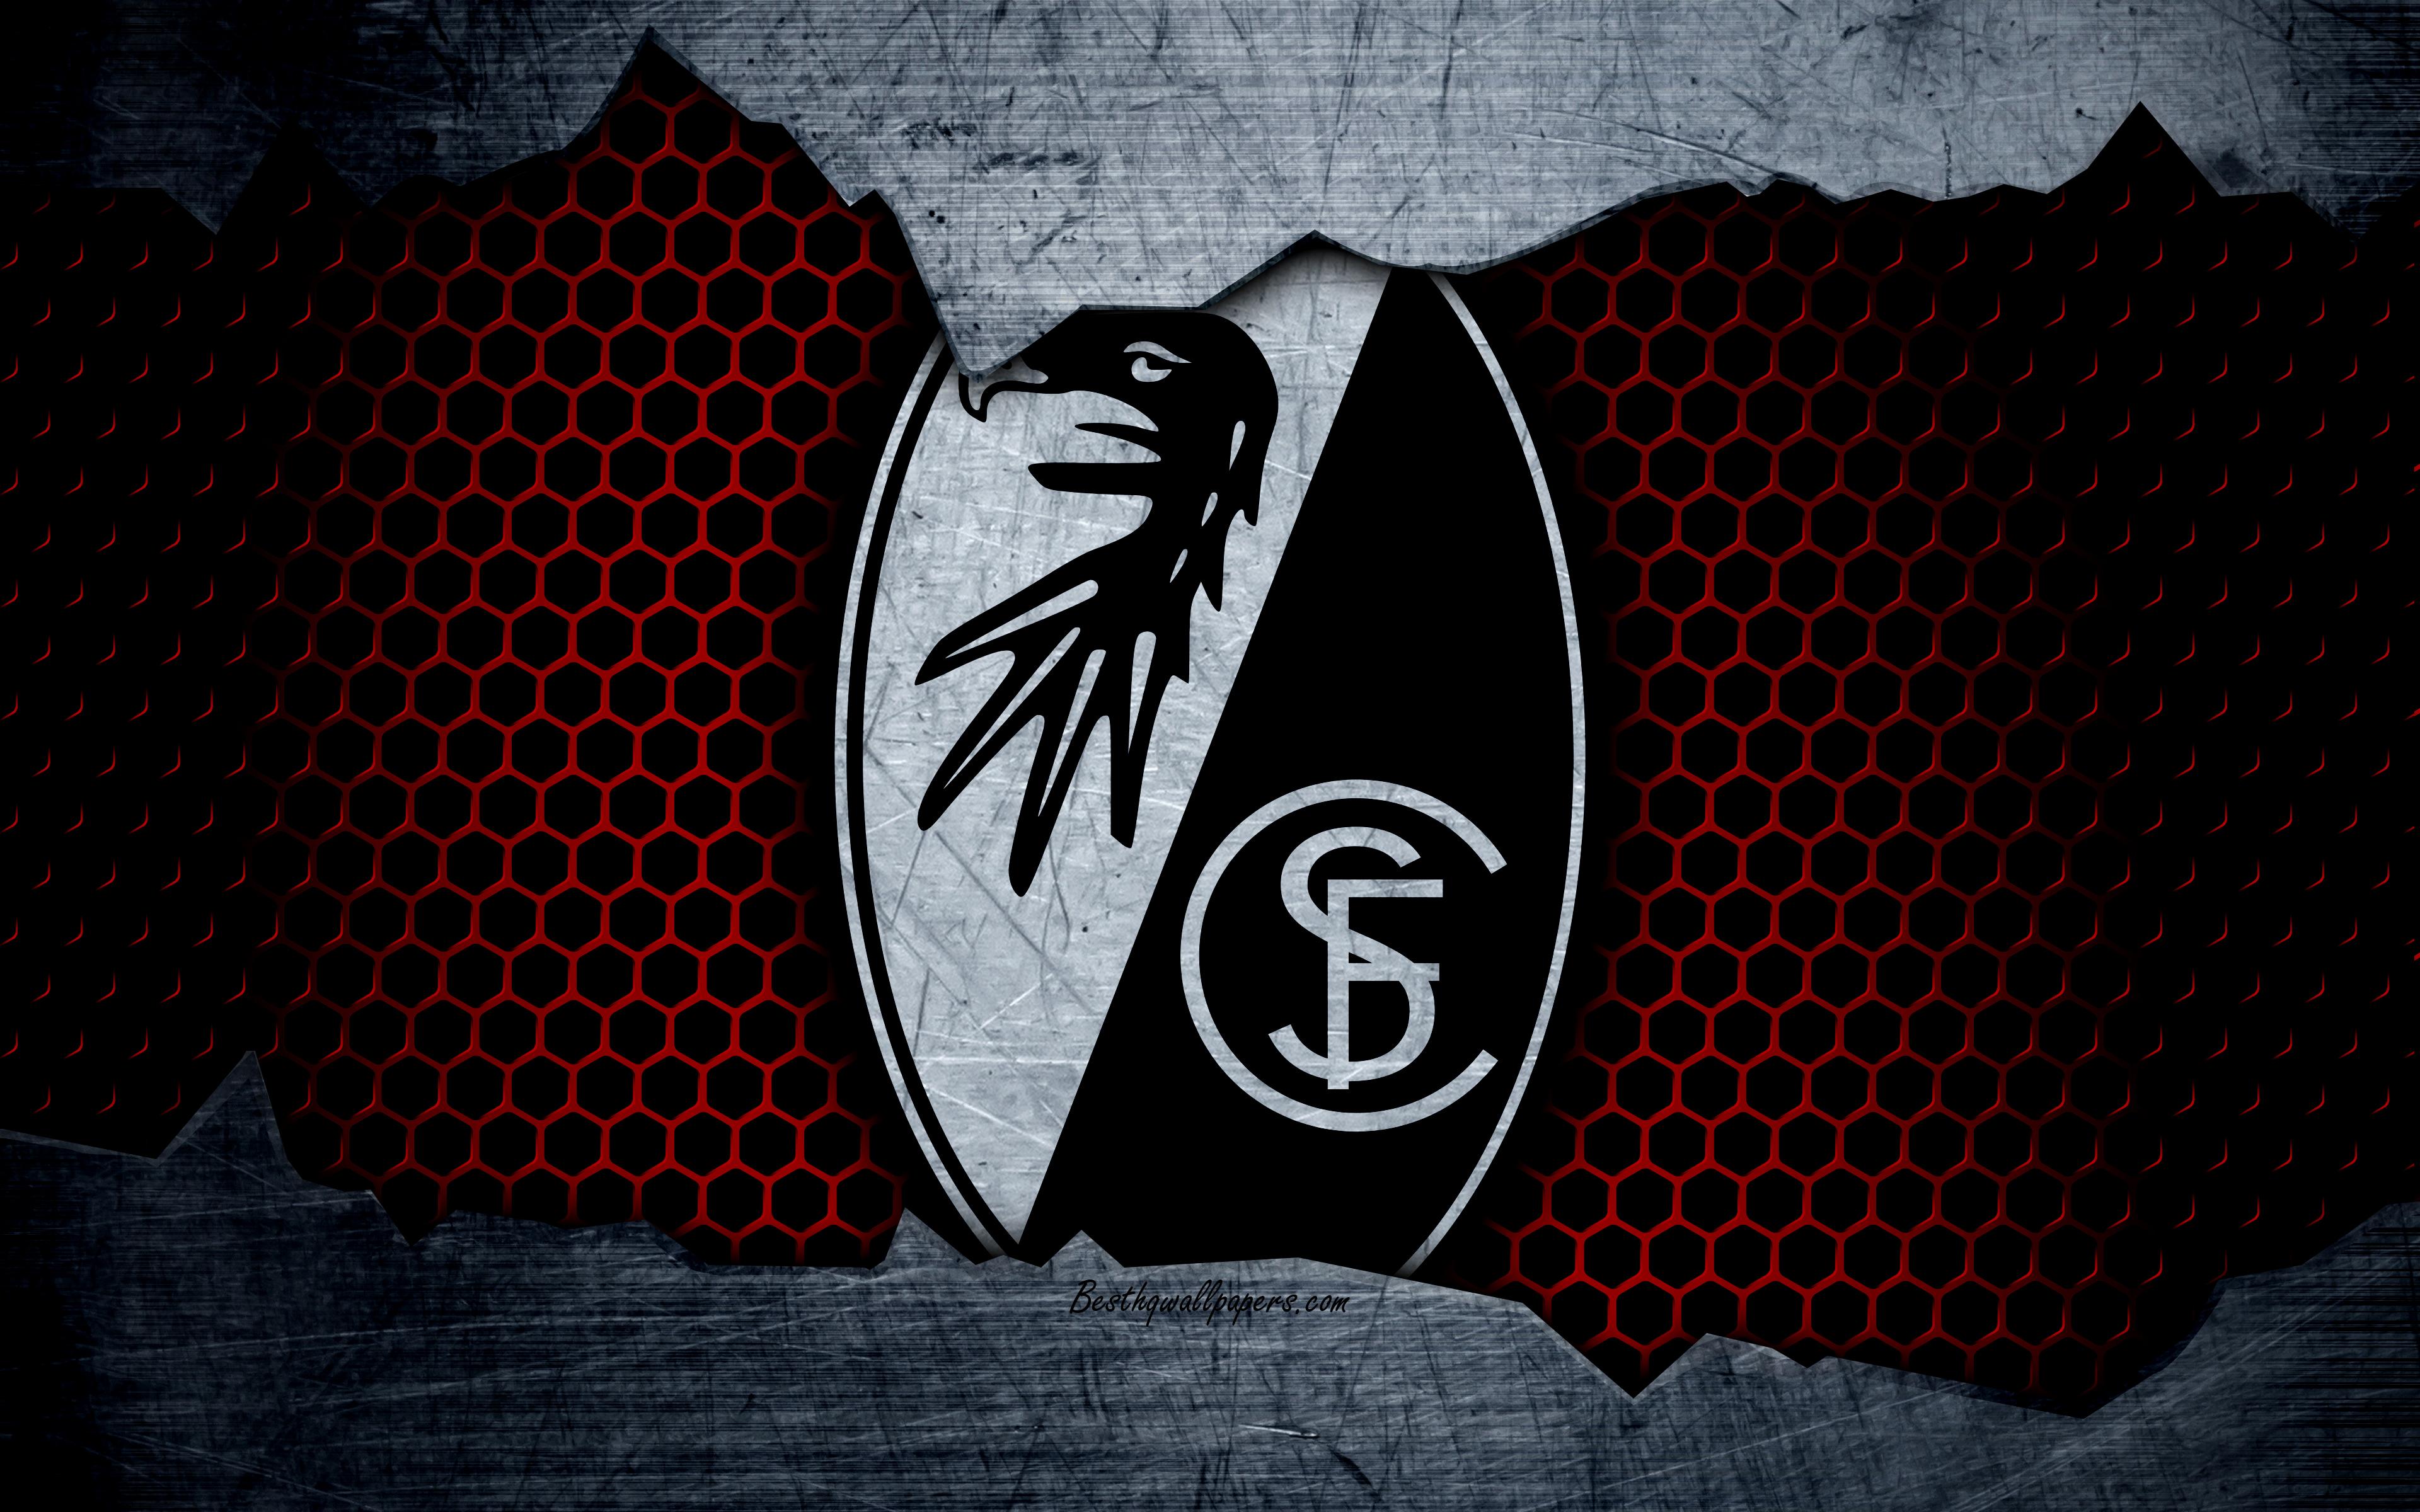 Download wallpapers Freiburg 4k logo Bundesliga metal texture 3840x2400